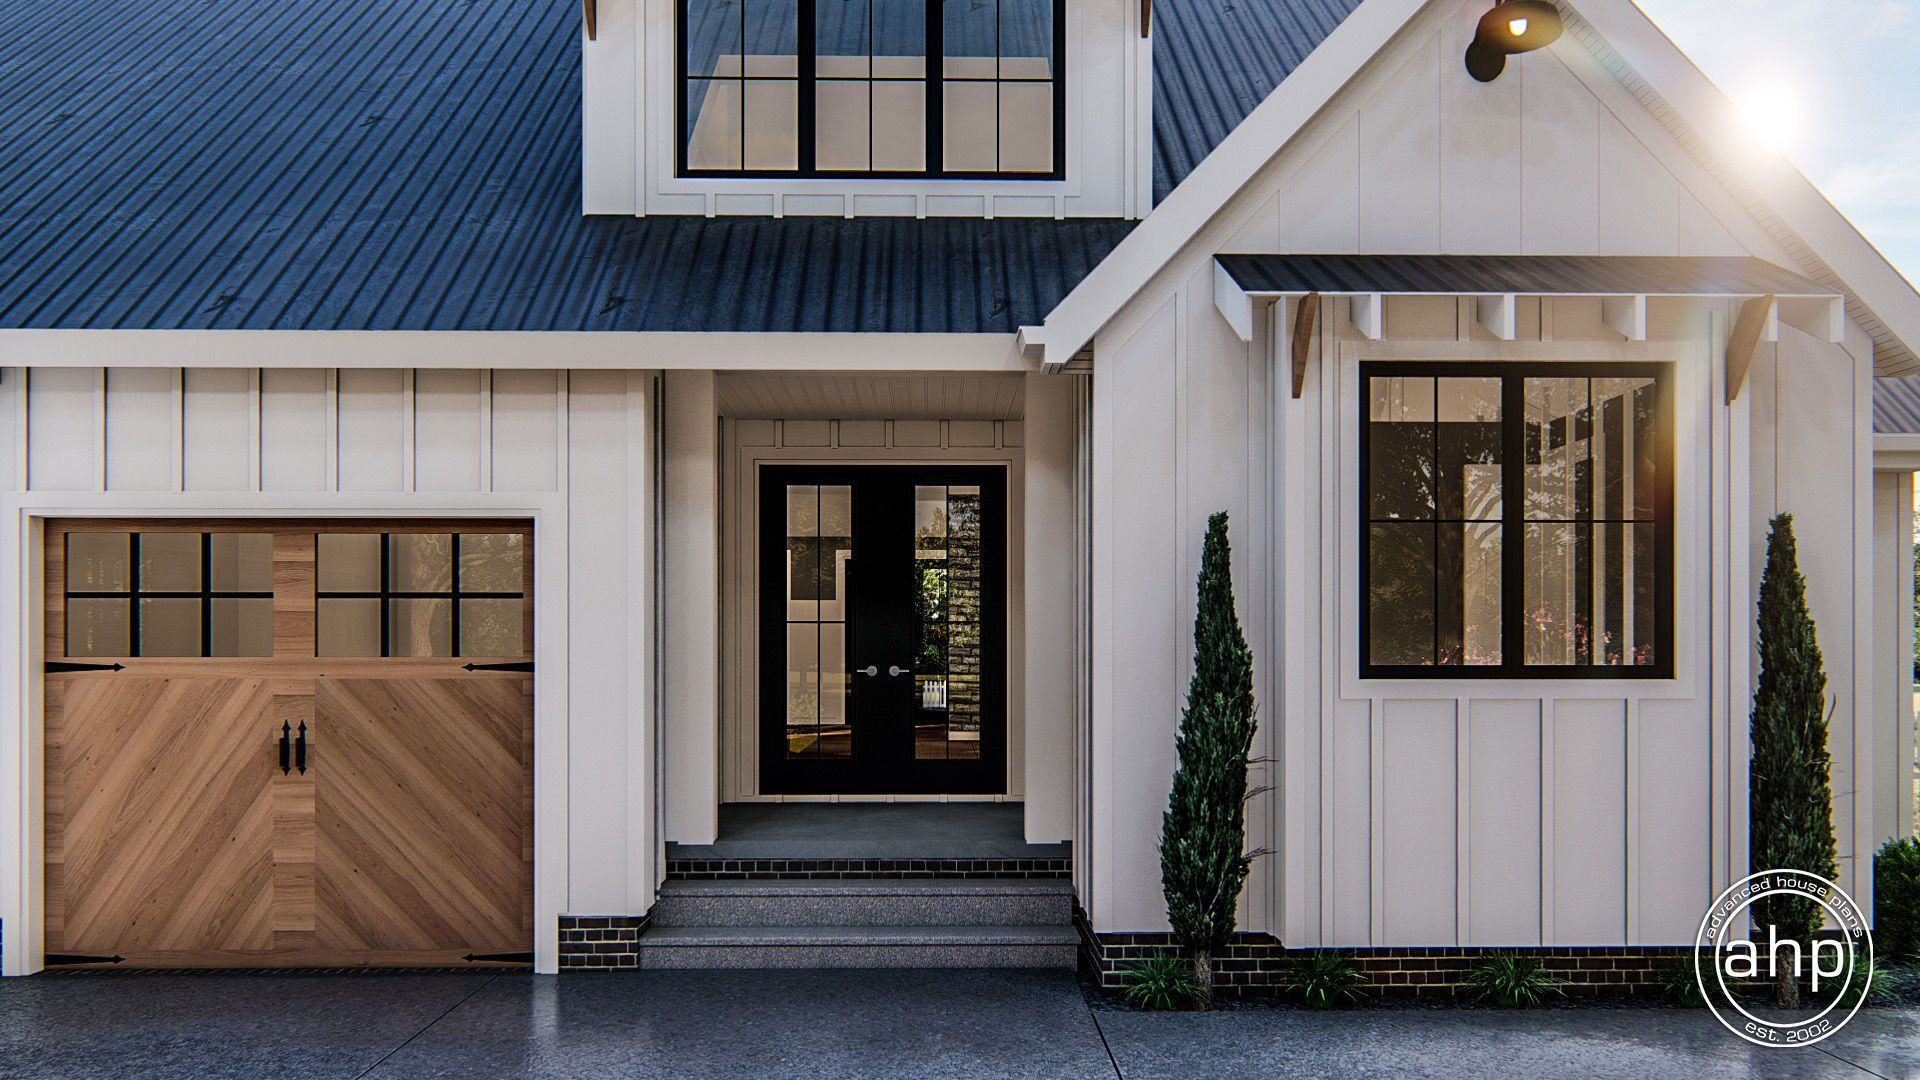 Sanibel 1 Story Modern Farmhouse House Plan | Modern ...